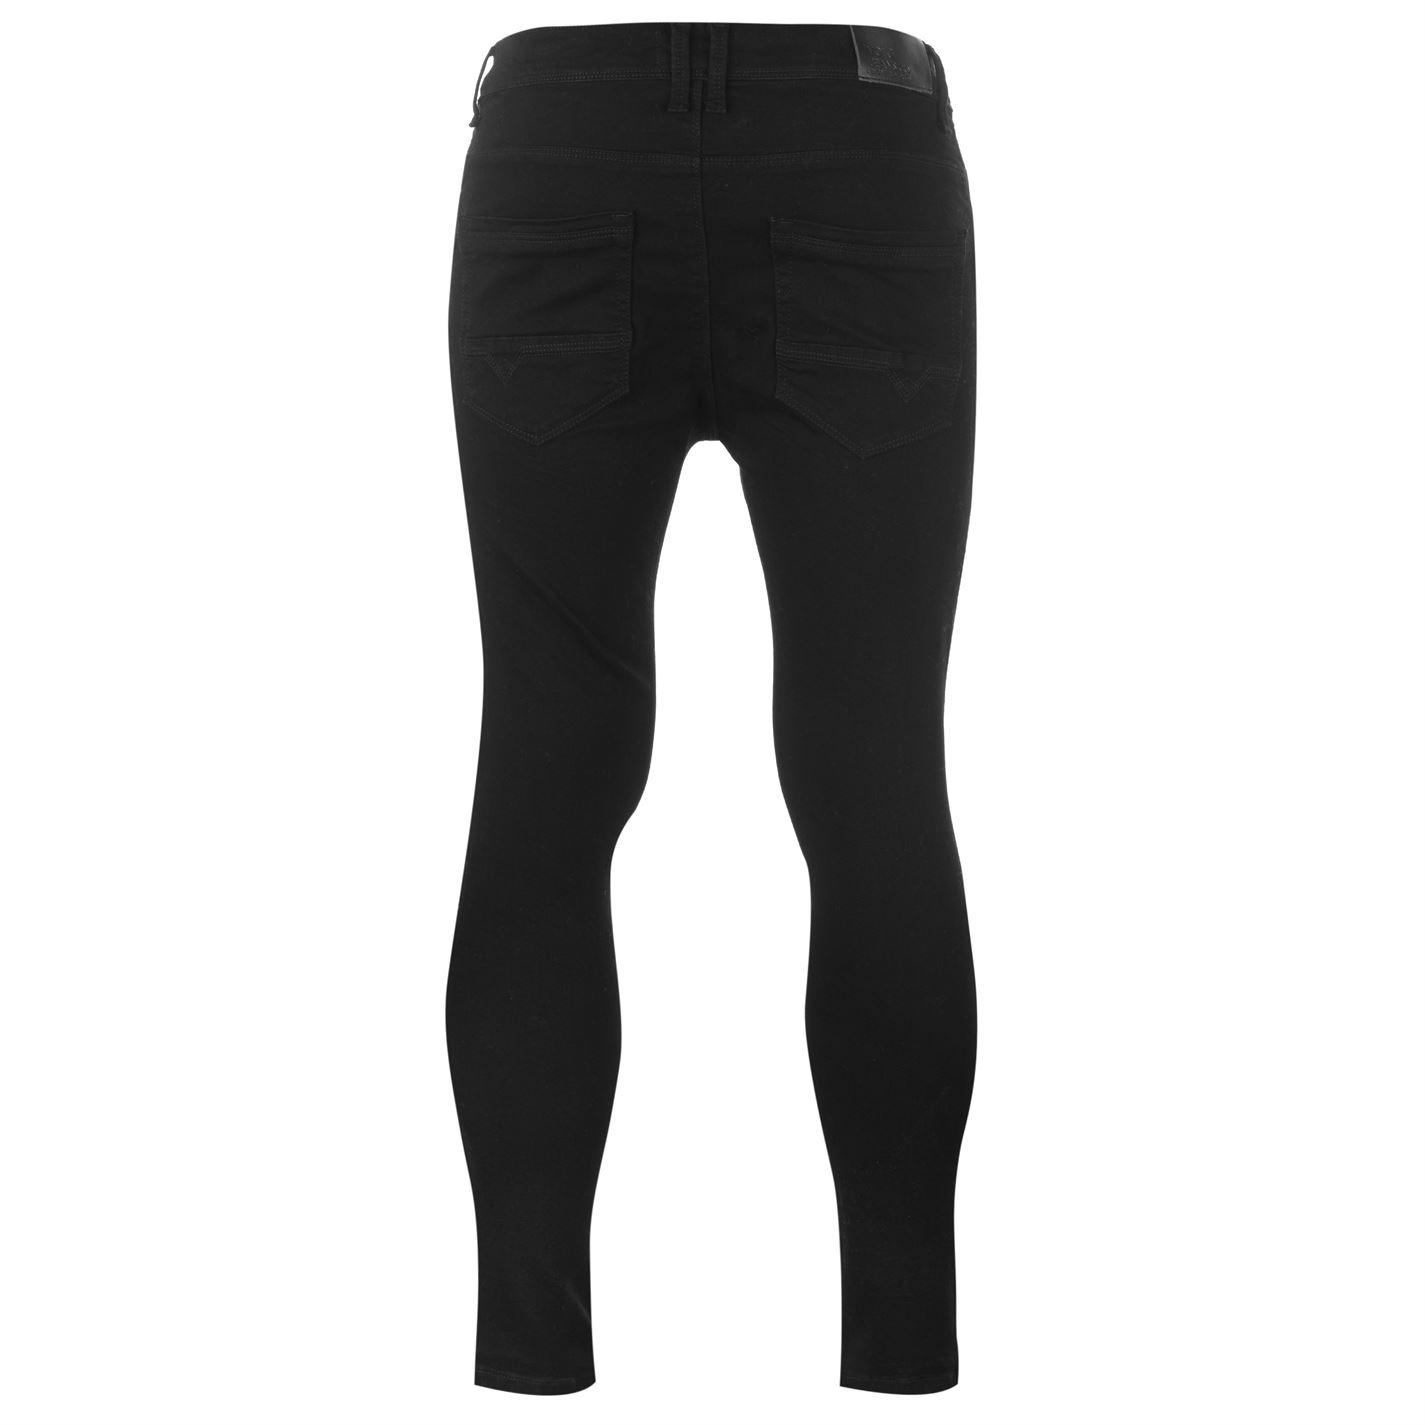 Voi pulverizeronskinnystr S84 Hommes Gents Skinny Jeans Pantalon Pantalon